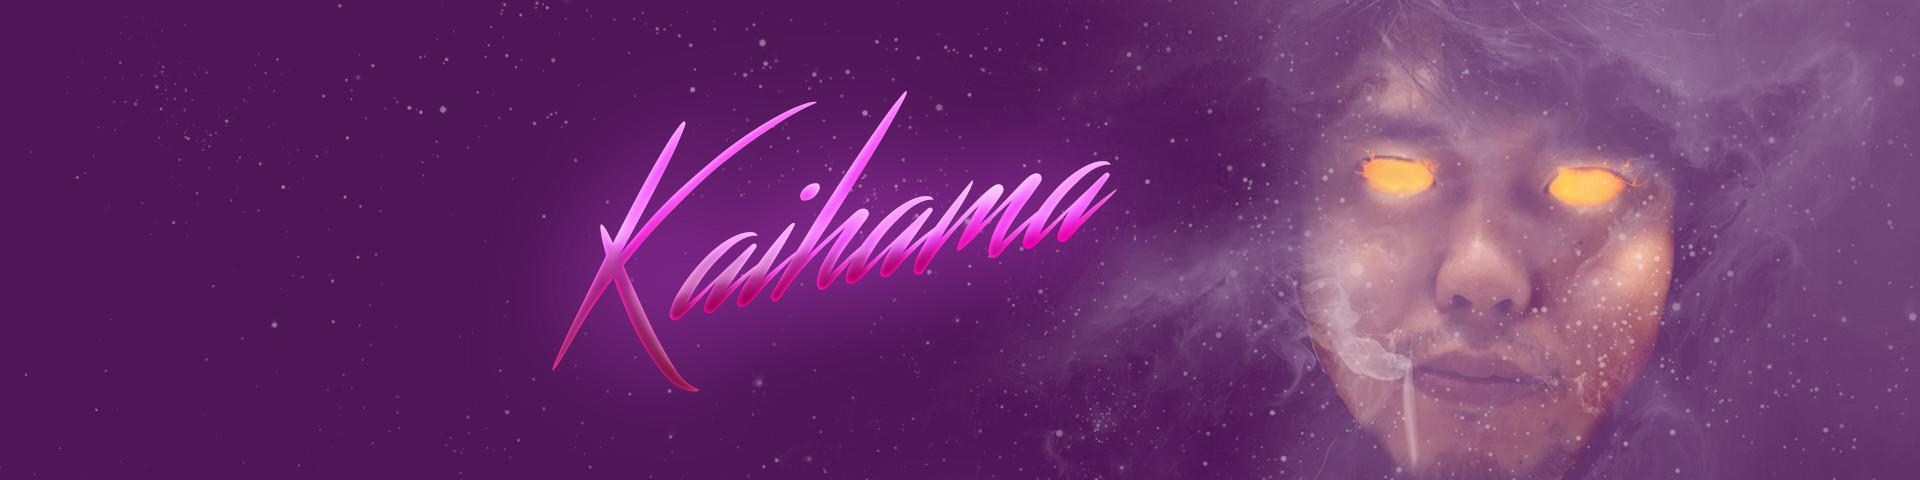 Kaihama